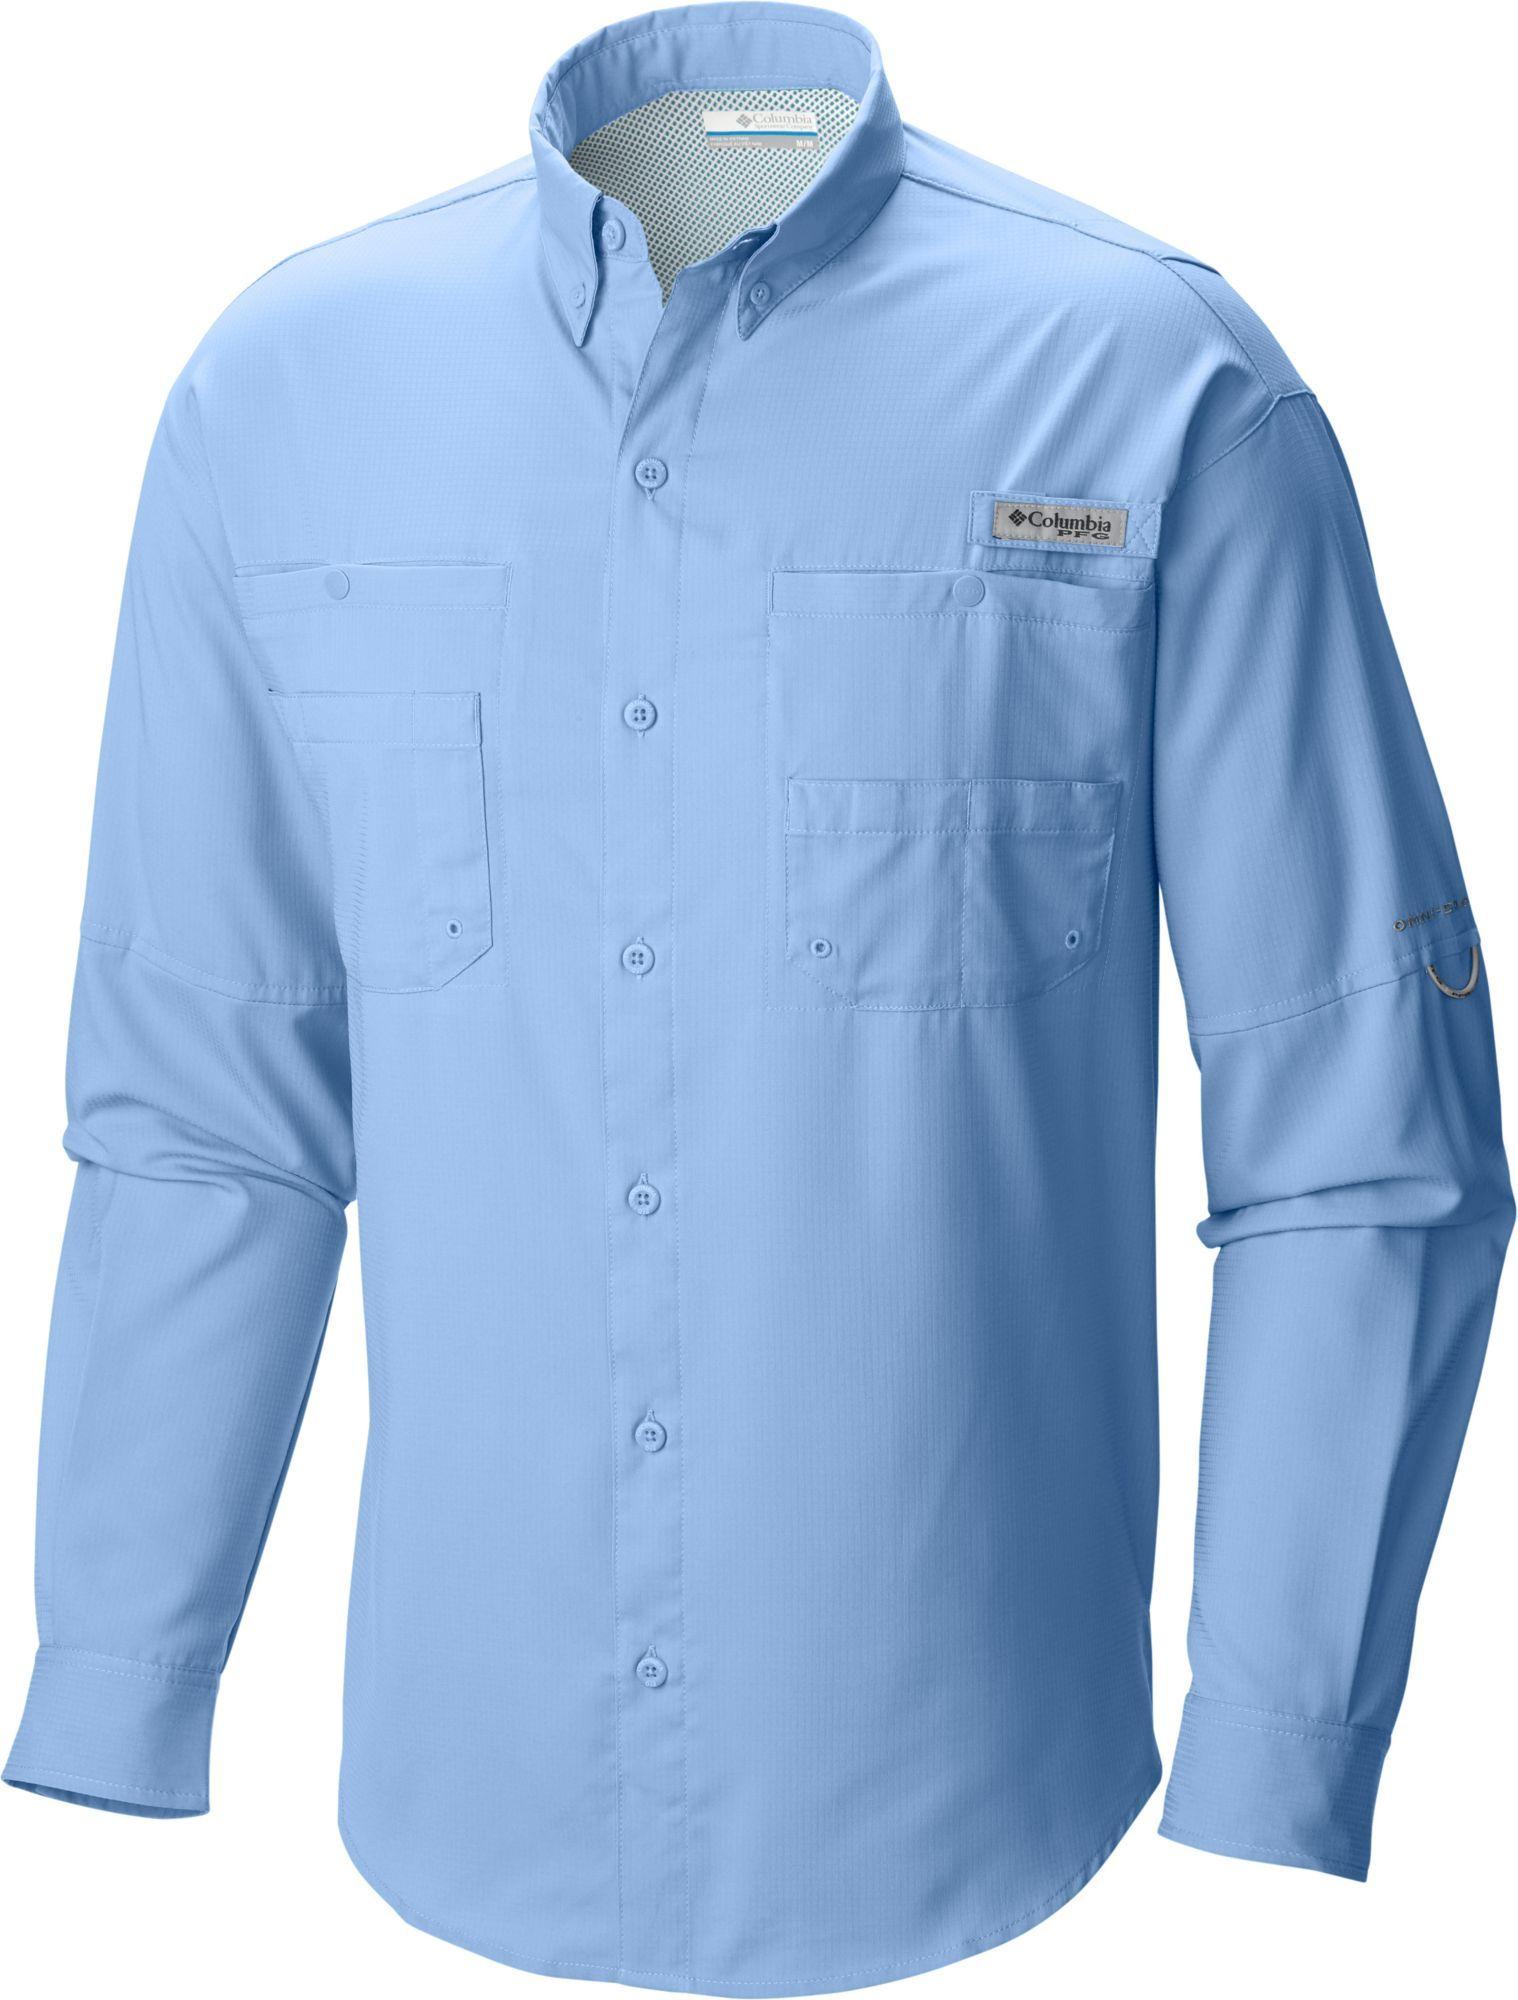 22485c97fde Columbia Mens Tamiami Ii Long Sleeve Shirt Sale Medium – EDGE ...